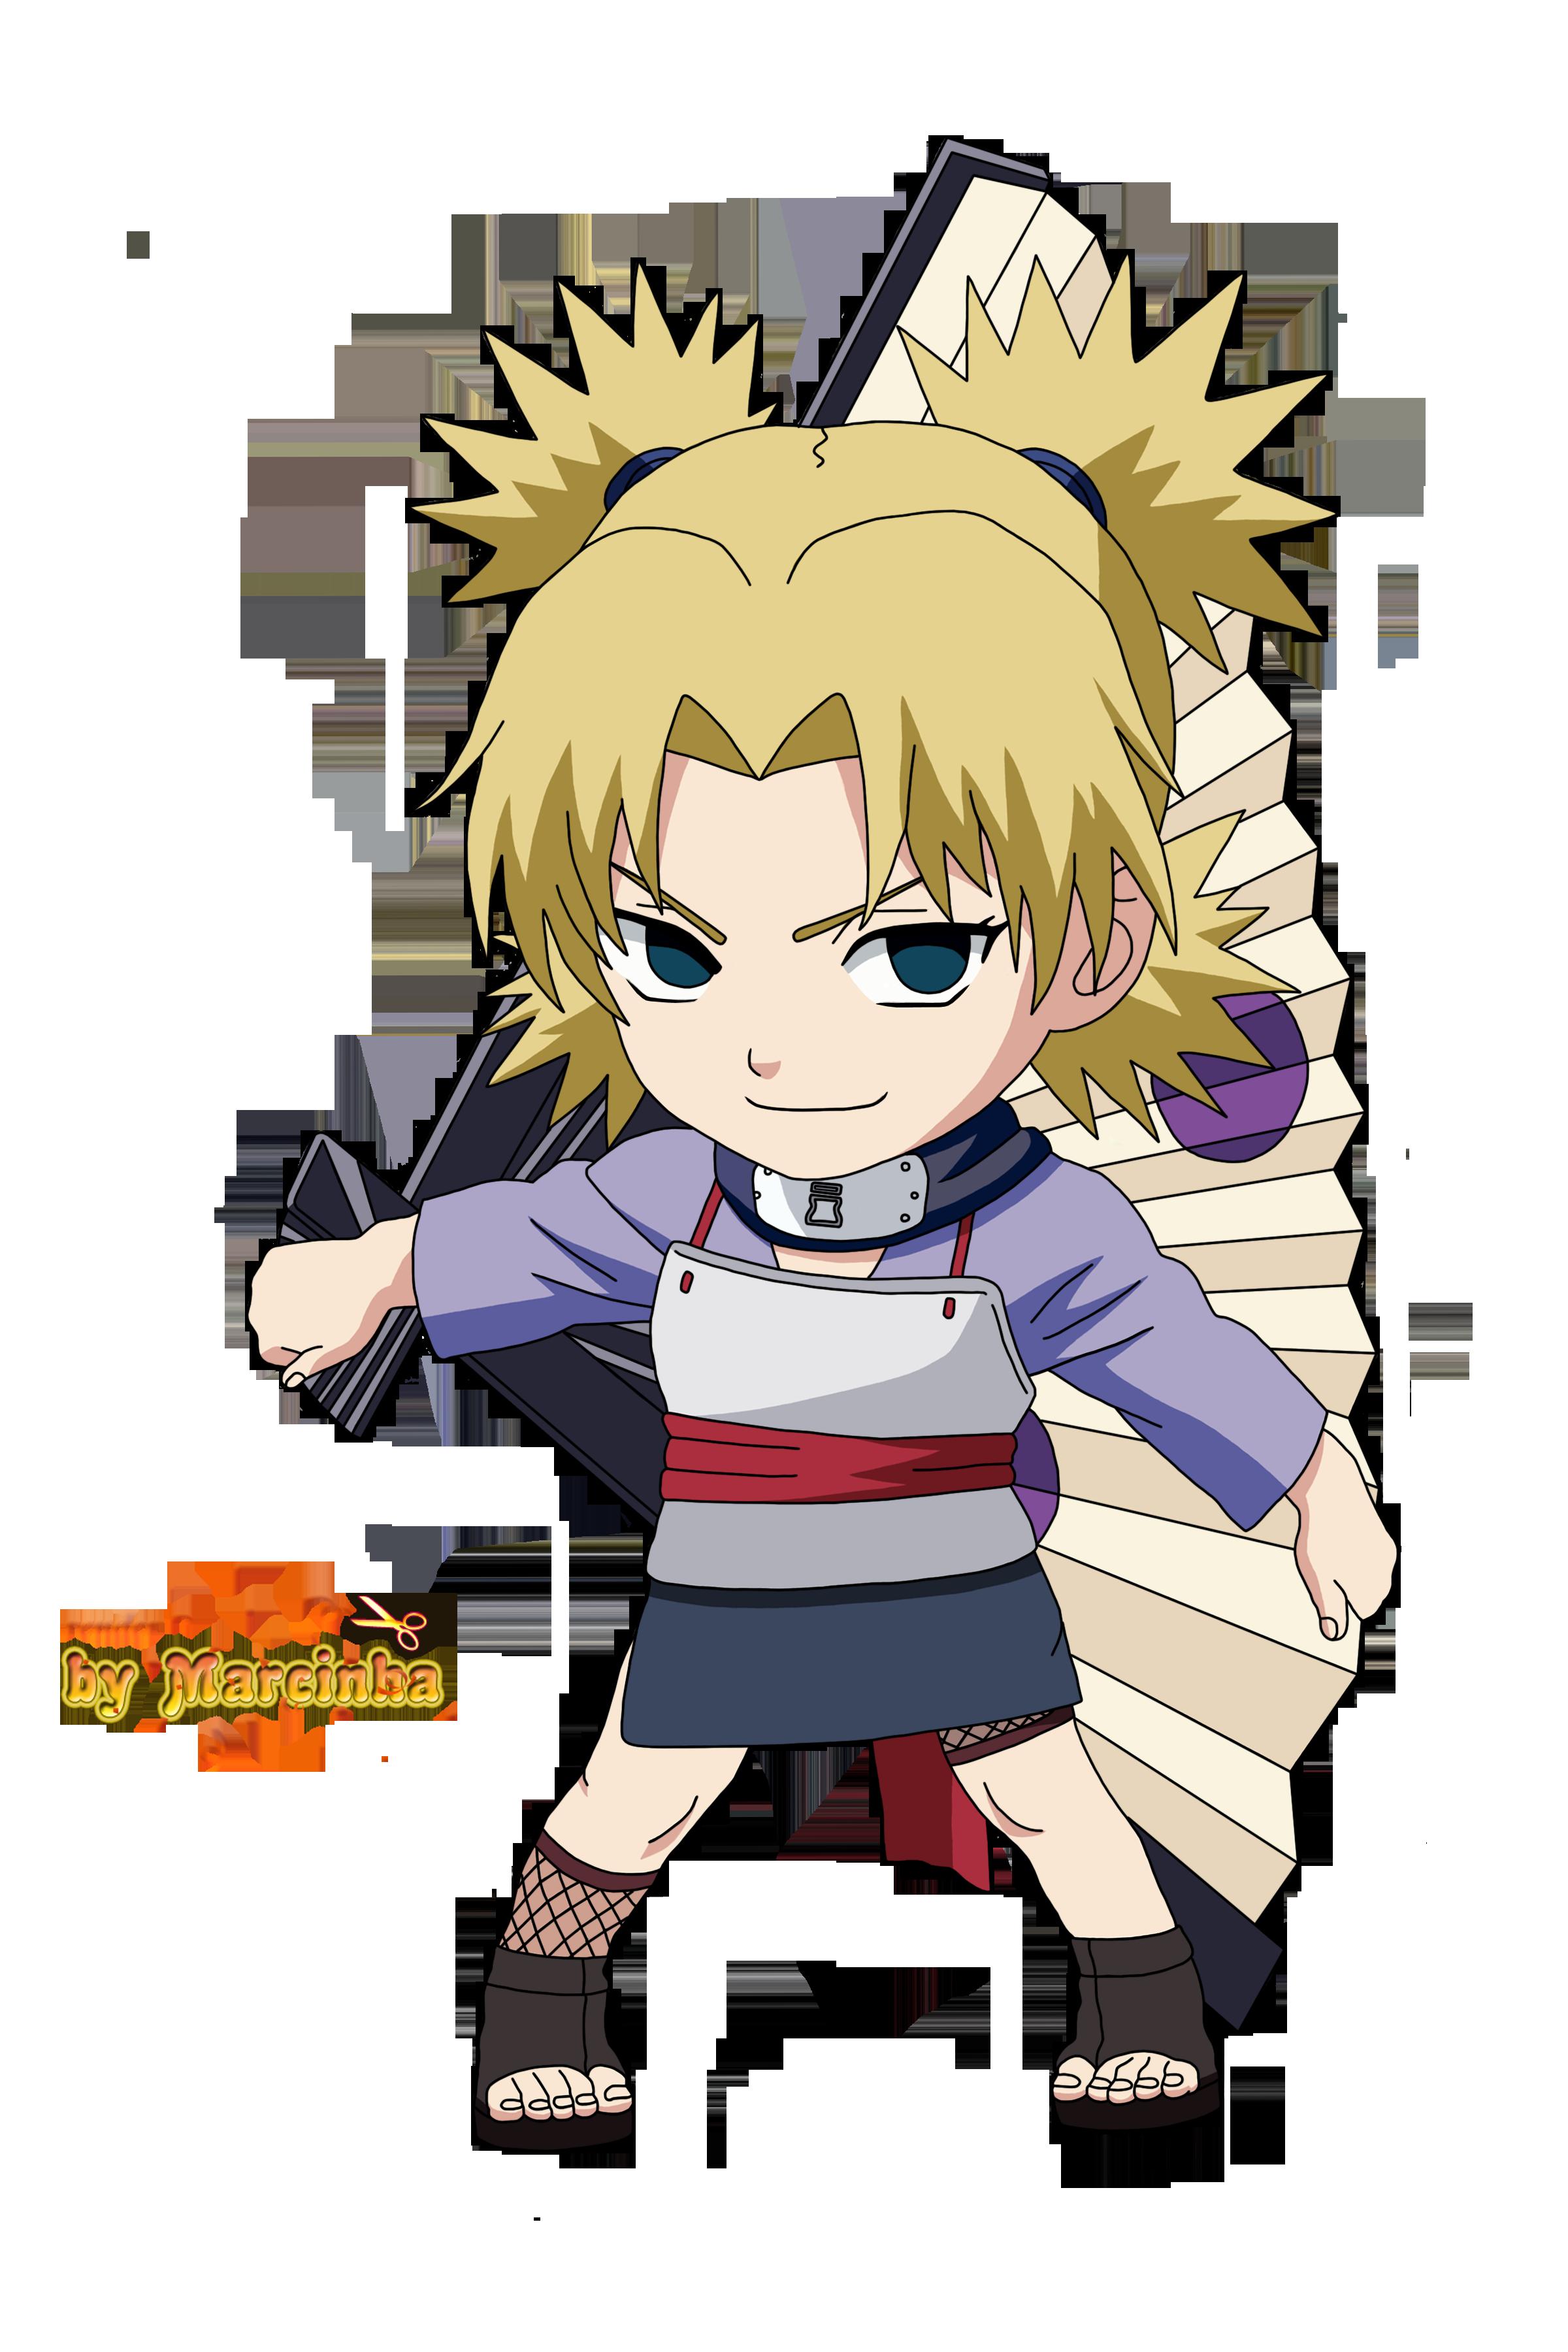 épinglé Par Kamisama Dede Sur Naruto Sasuke Chibi Et Naruto